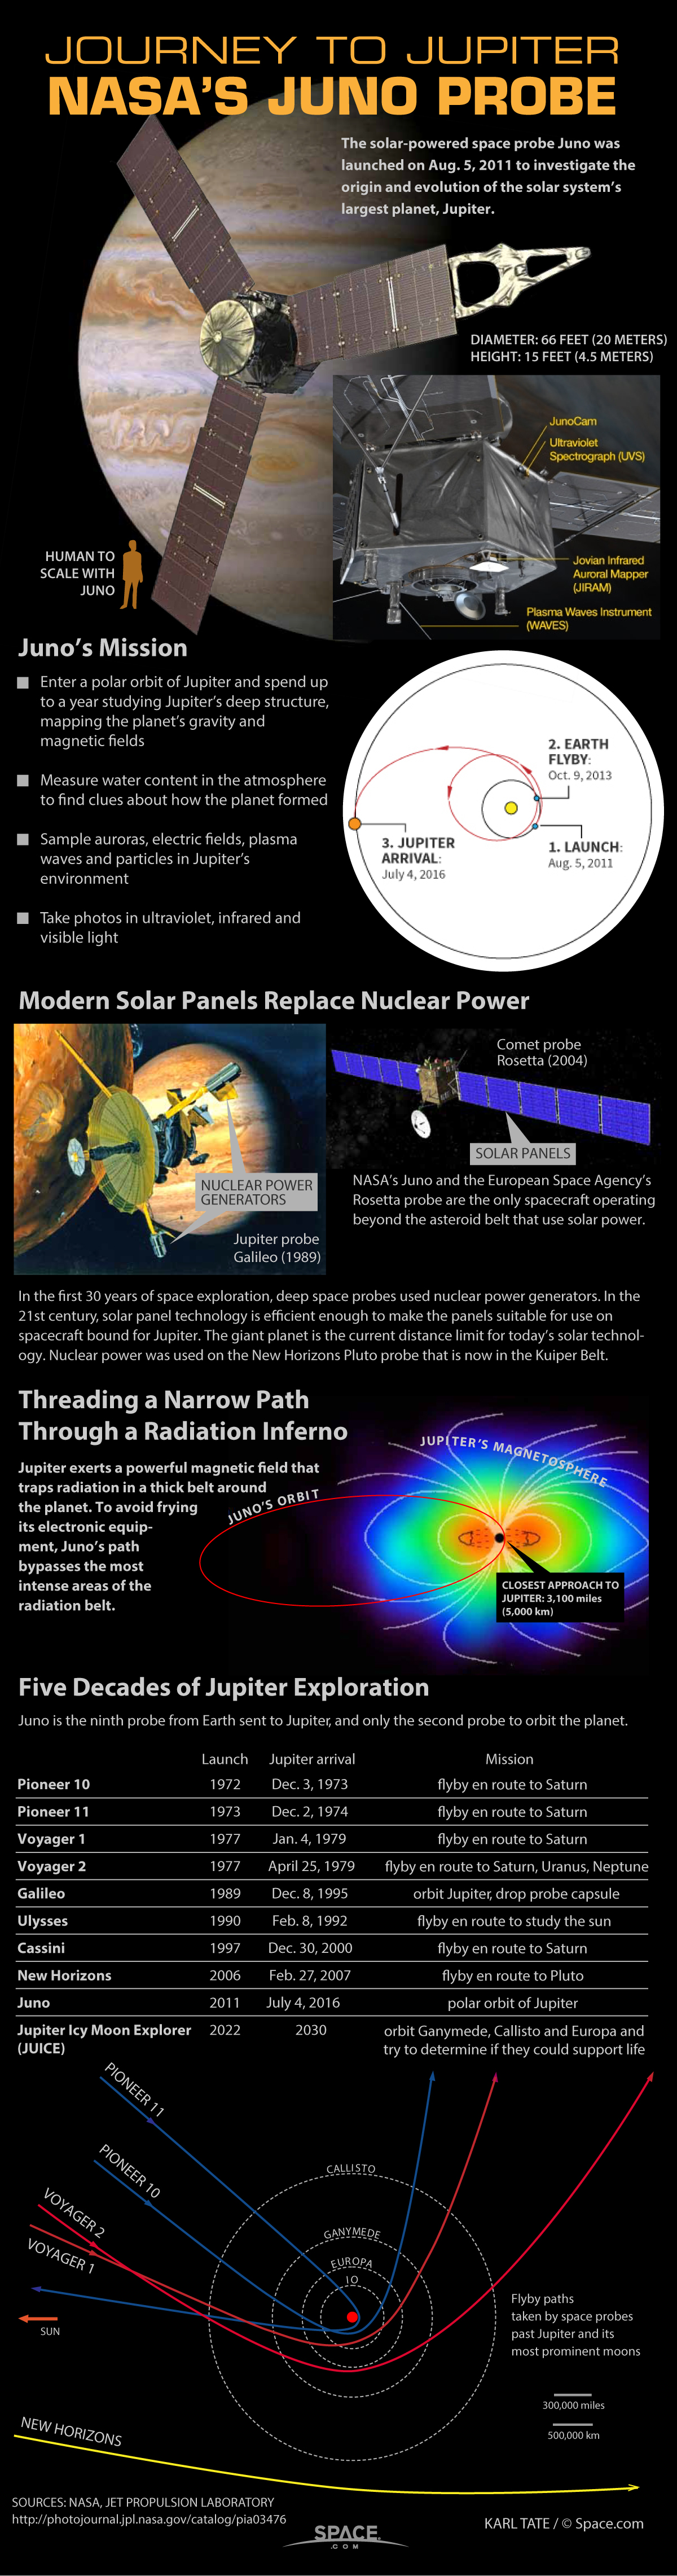 NASA'S Juno Probe (Infographic)